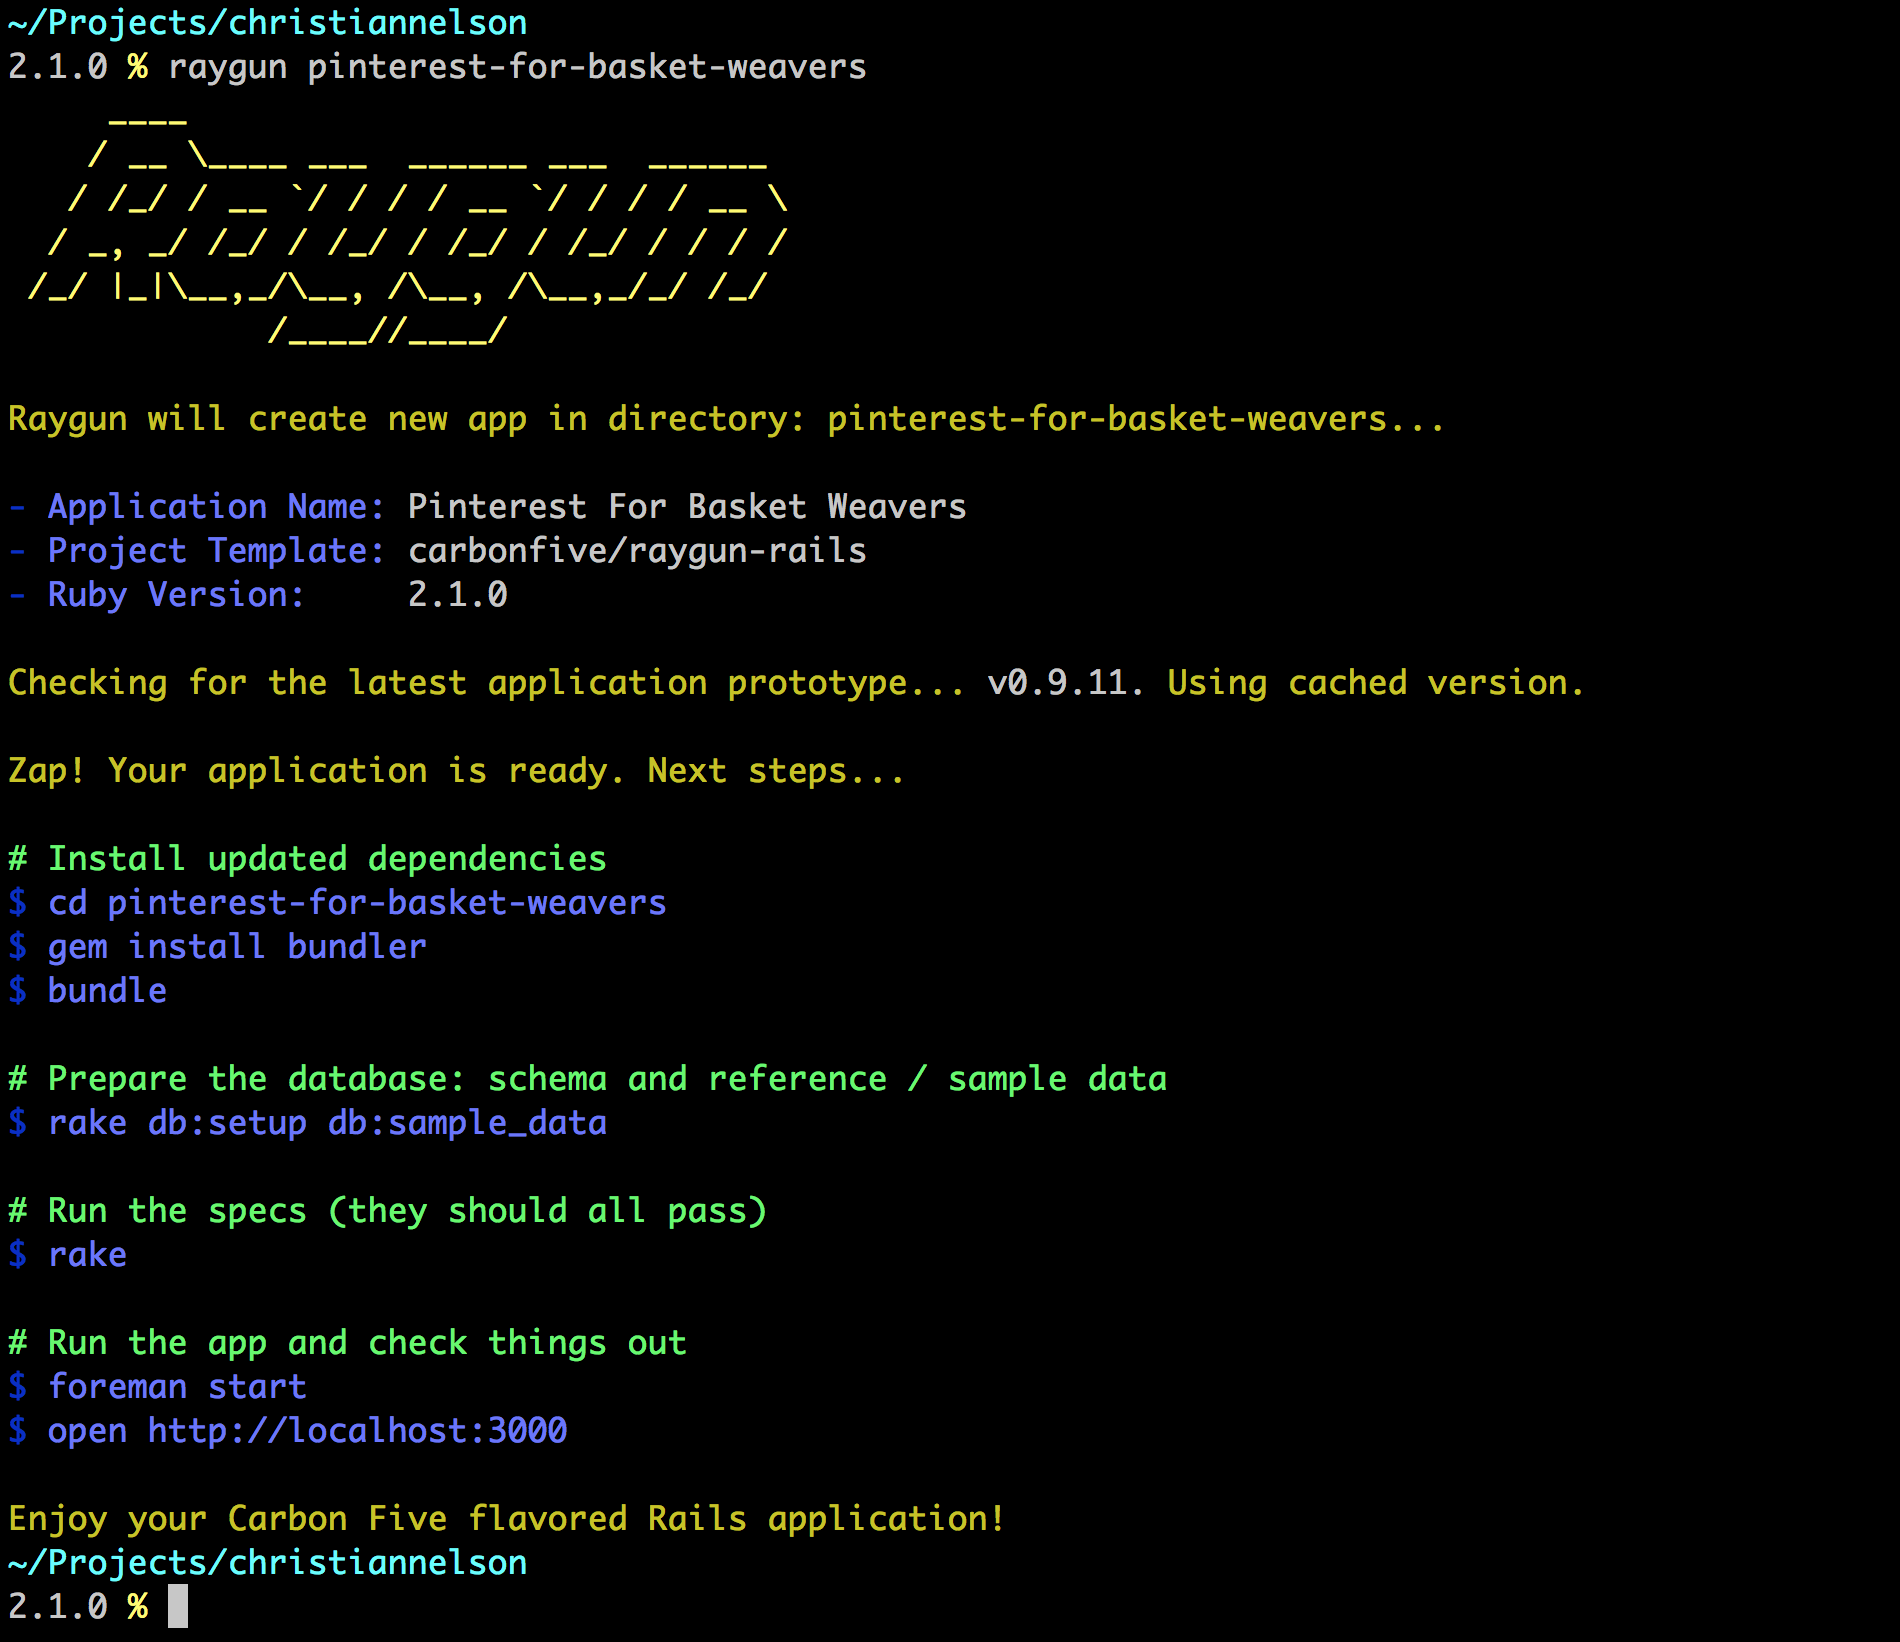 raygun-output